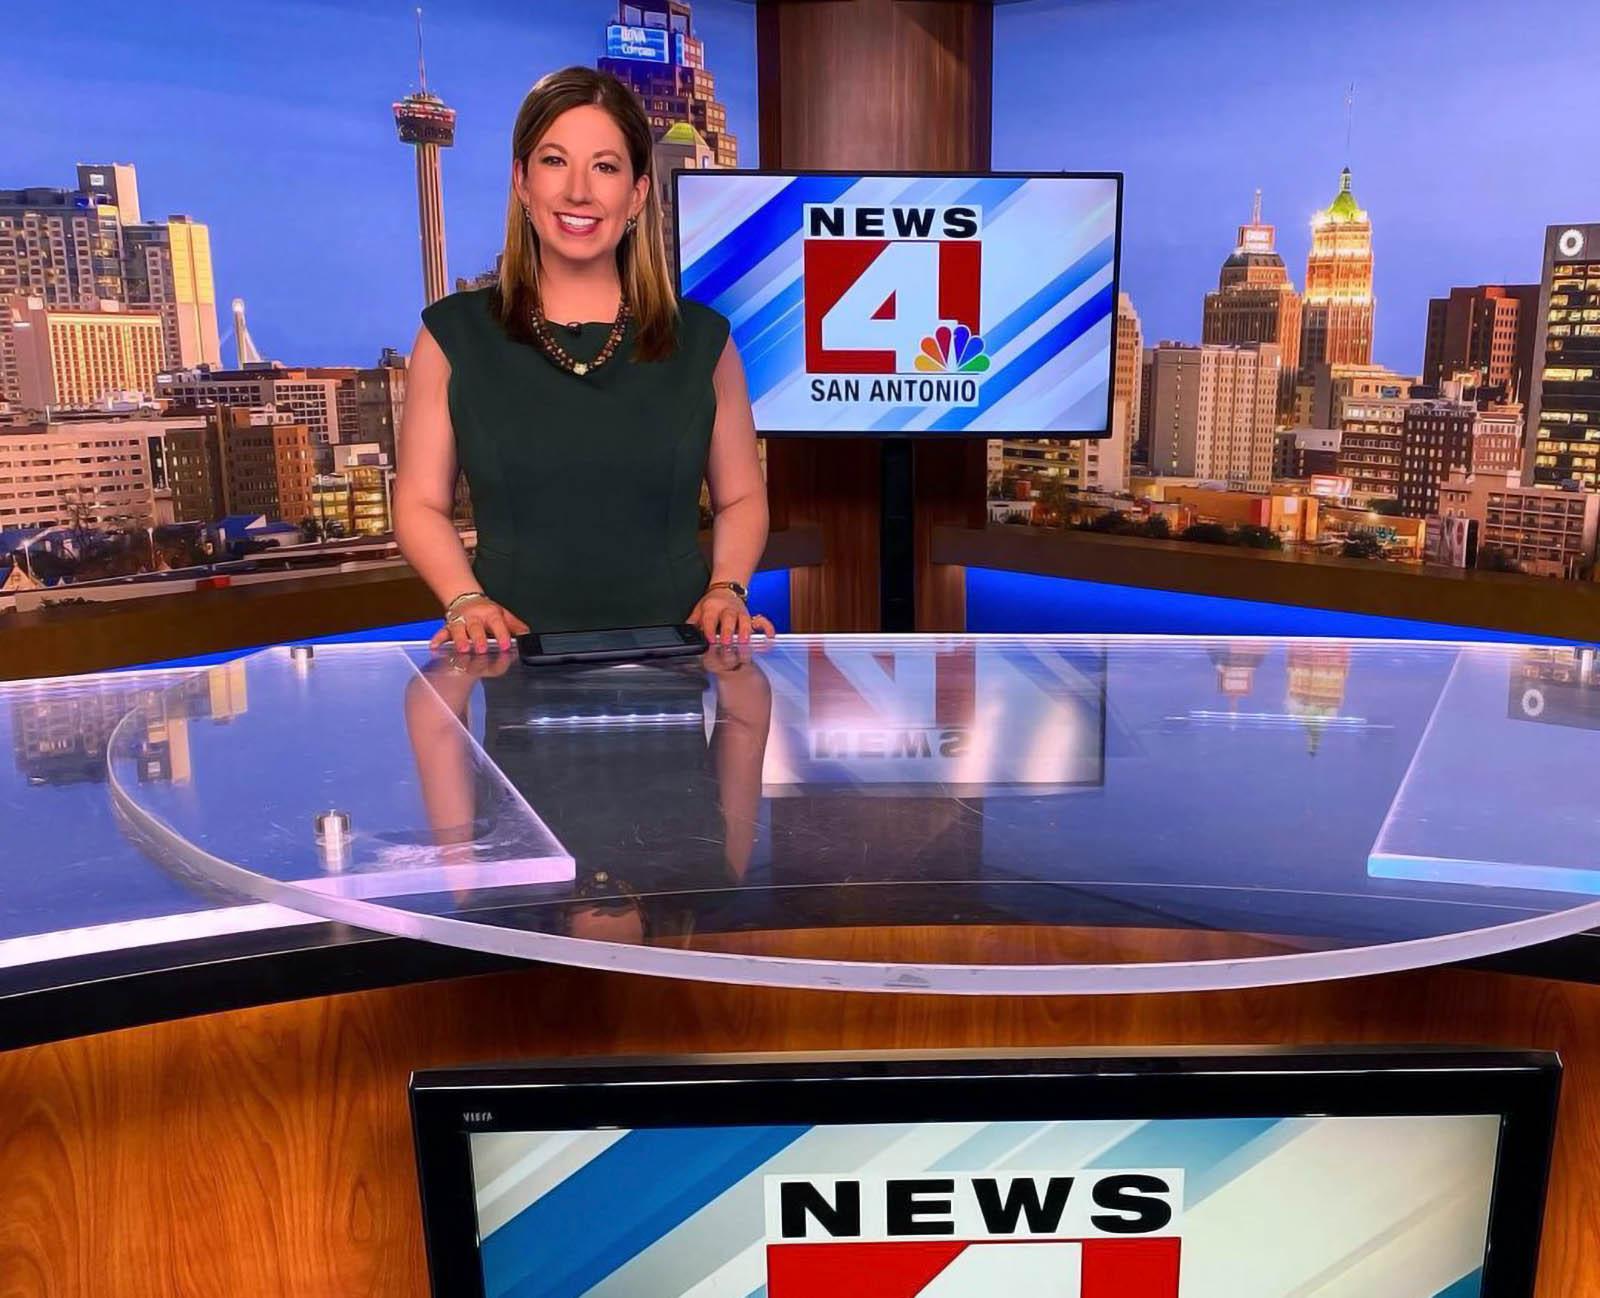 Emily Baucum on News 4 San Antonio studio